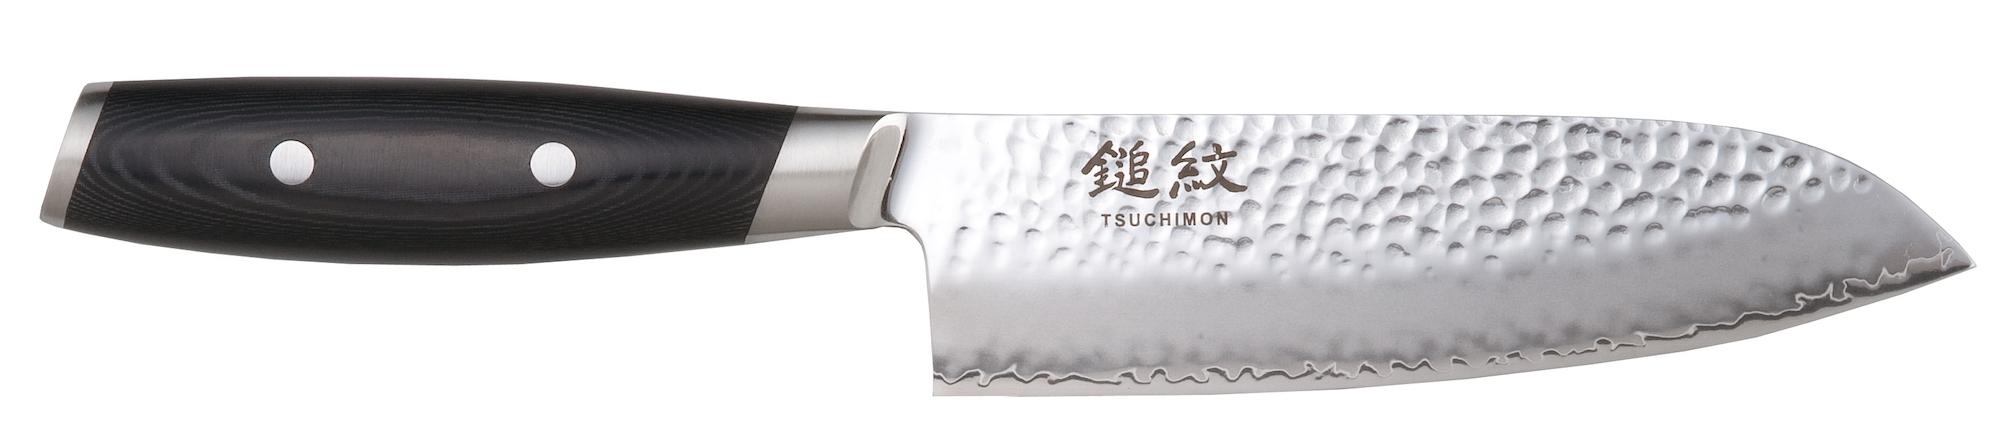 Yaxell Tsuchimon 3 Lagen